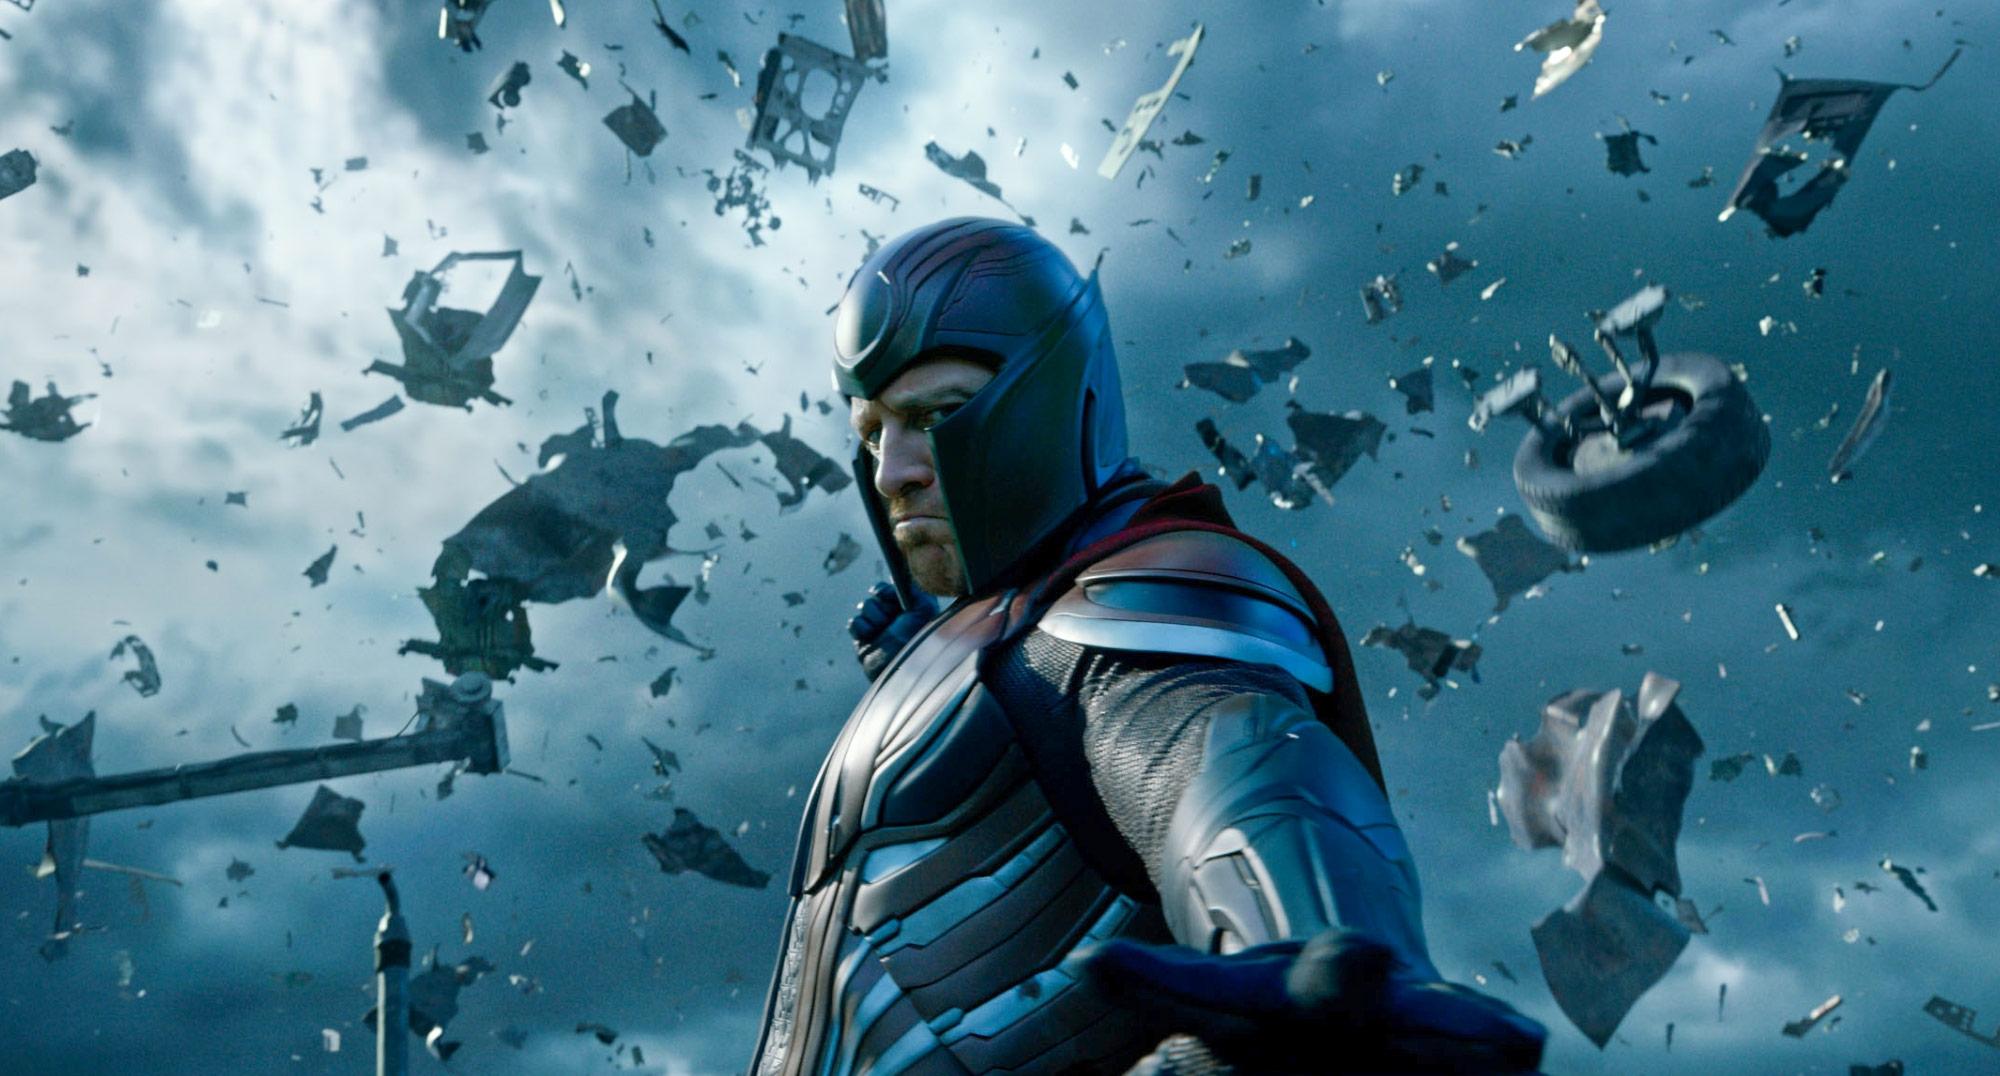 Download X-Men: Apocalypse Hollywood full blu-ray movie 2016